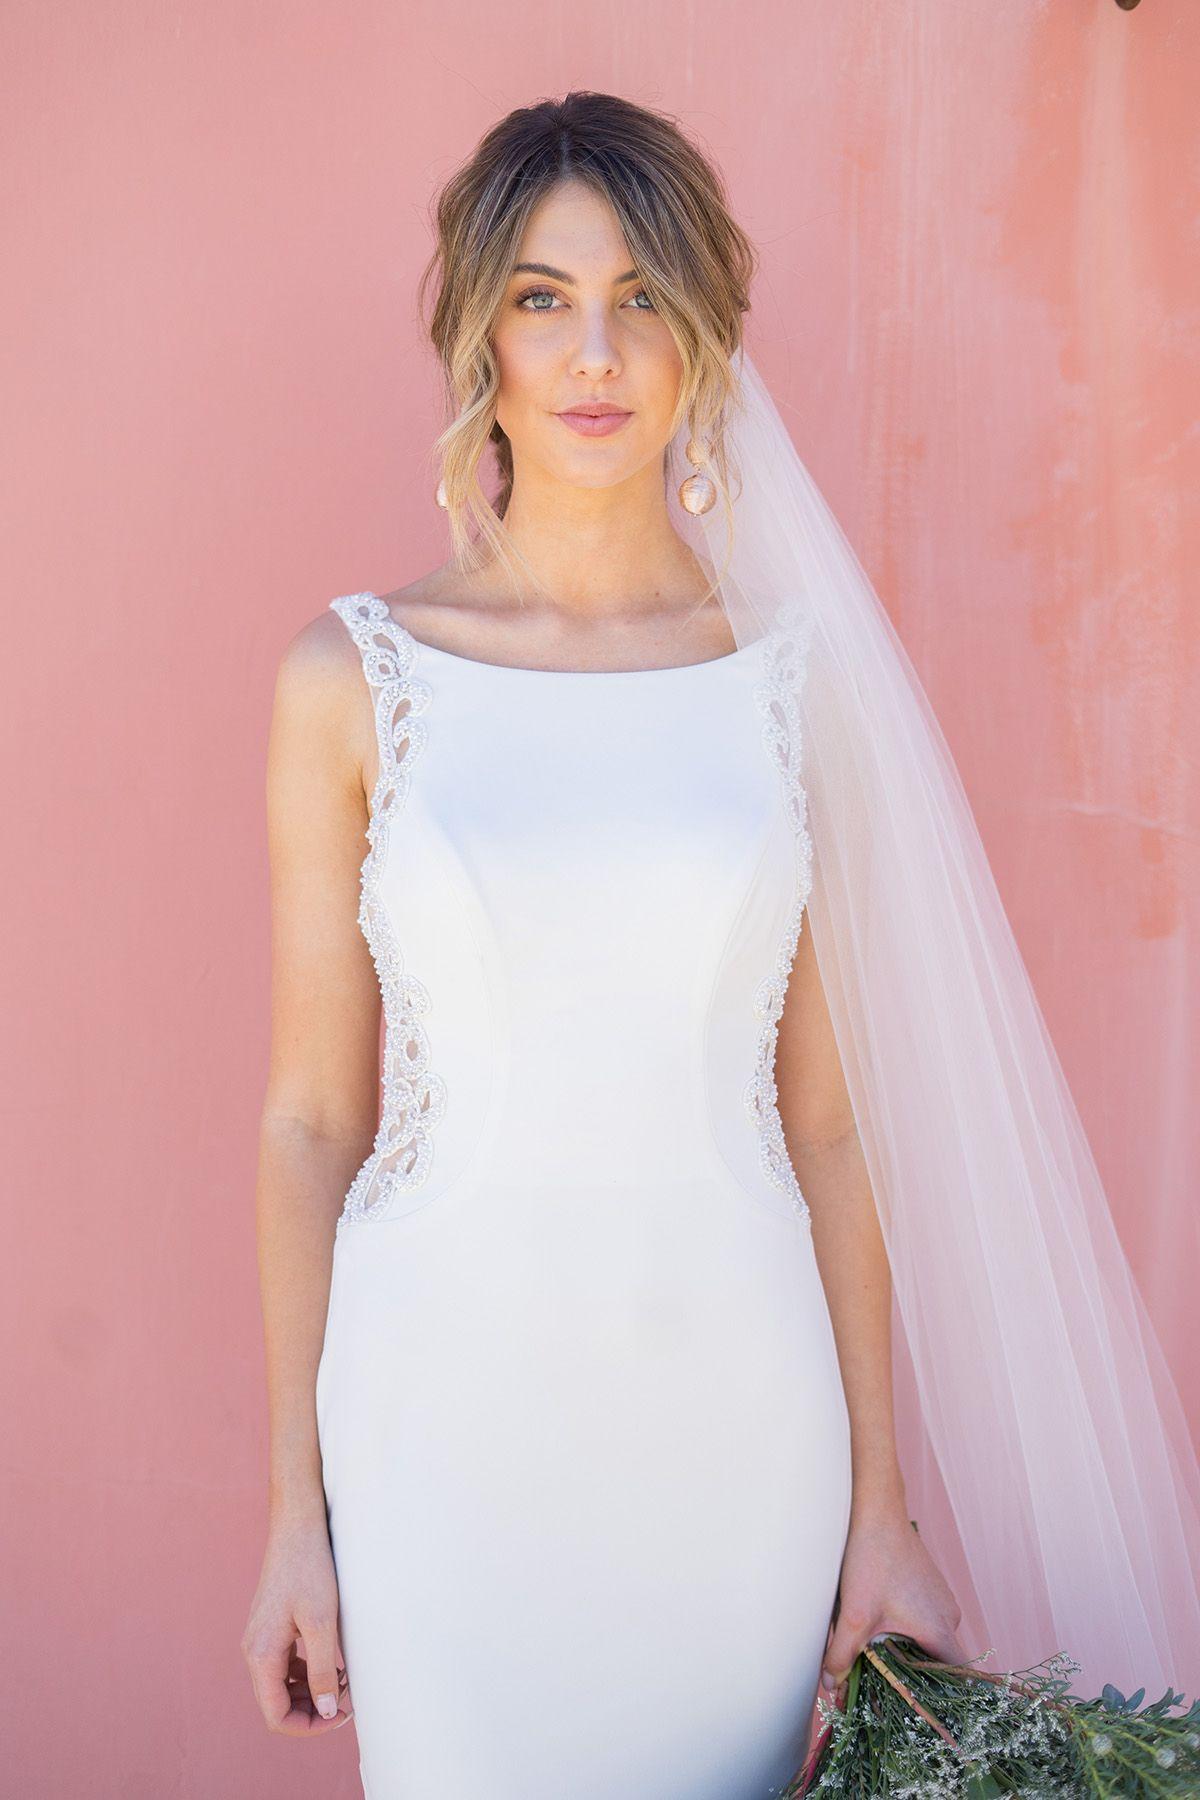 Beaded Illusion And Crepe Sheath Wedding Dress David S Bridal Illusion Wedding Dress Davids Bridal Wedding Dresses Wedding Dress Sizes [ 1800 x 1200 Pixel ]